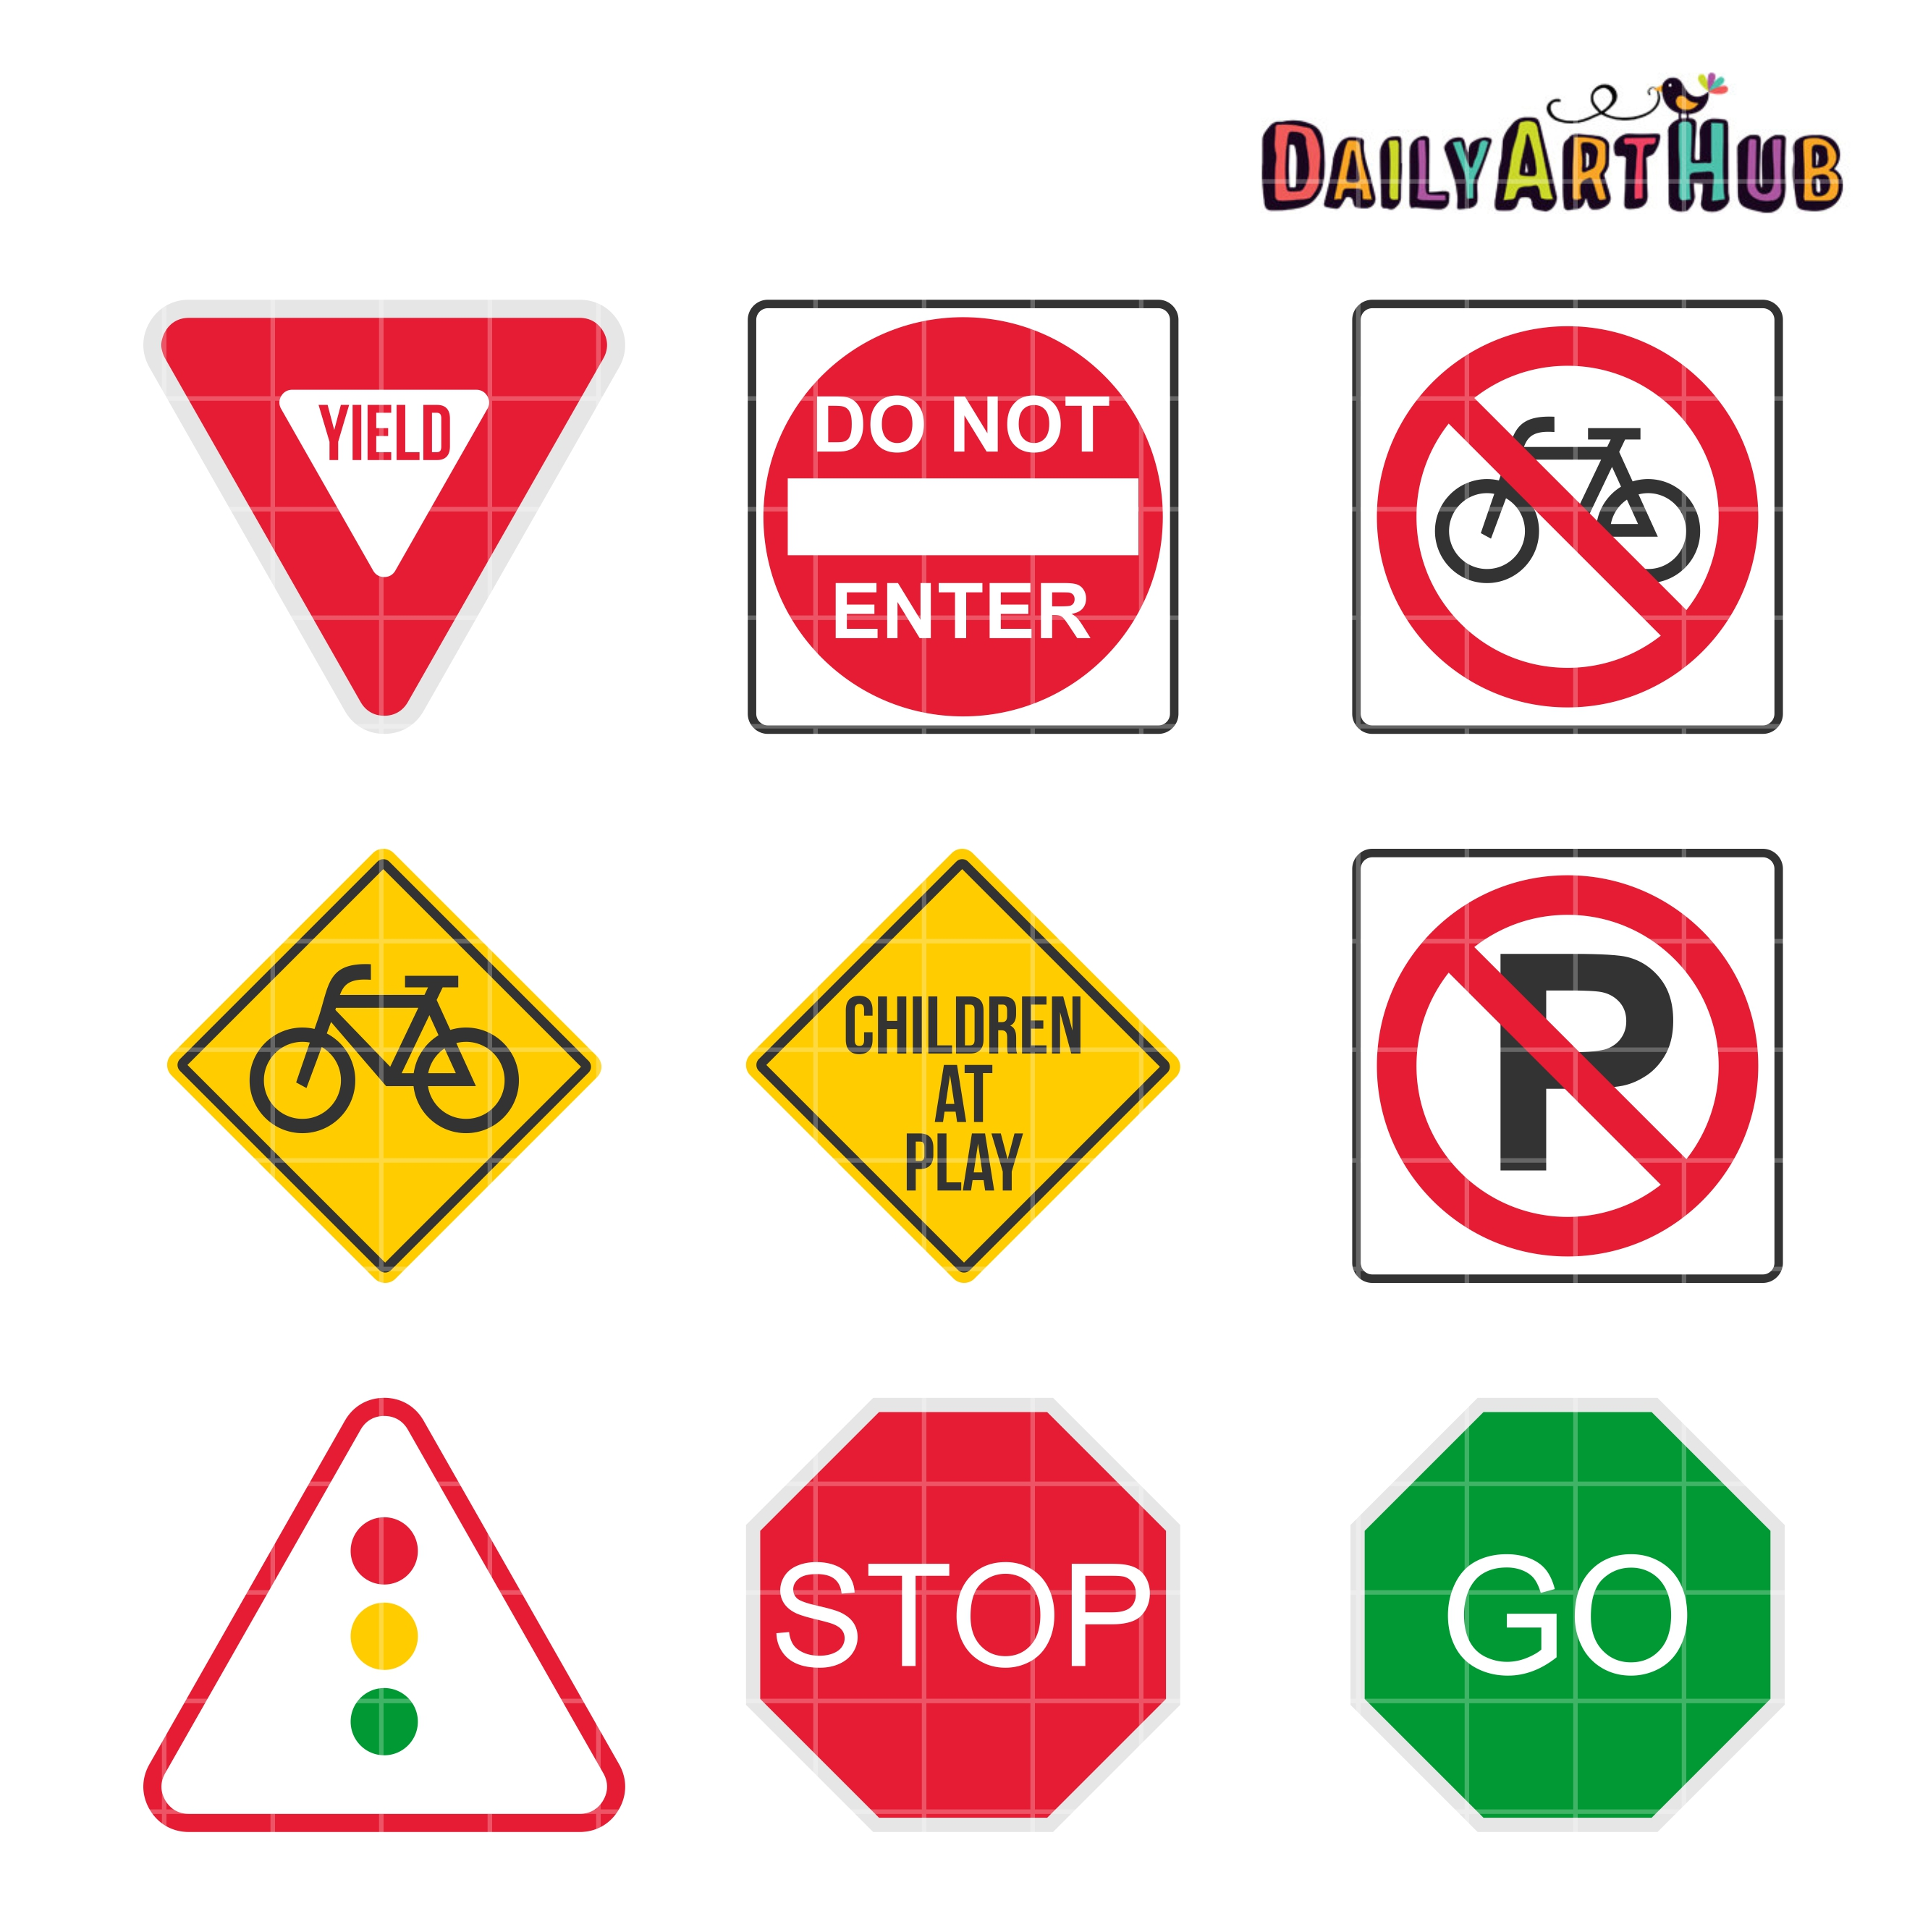 2664x2670 9 Road Signs Clip Art Set Daily Art Hub